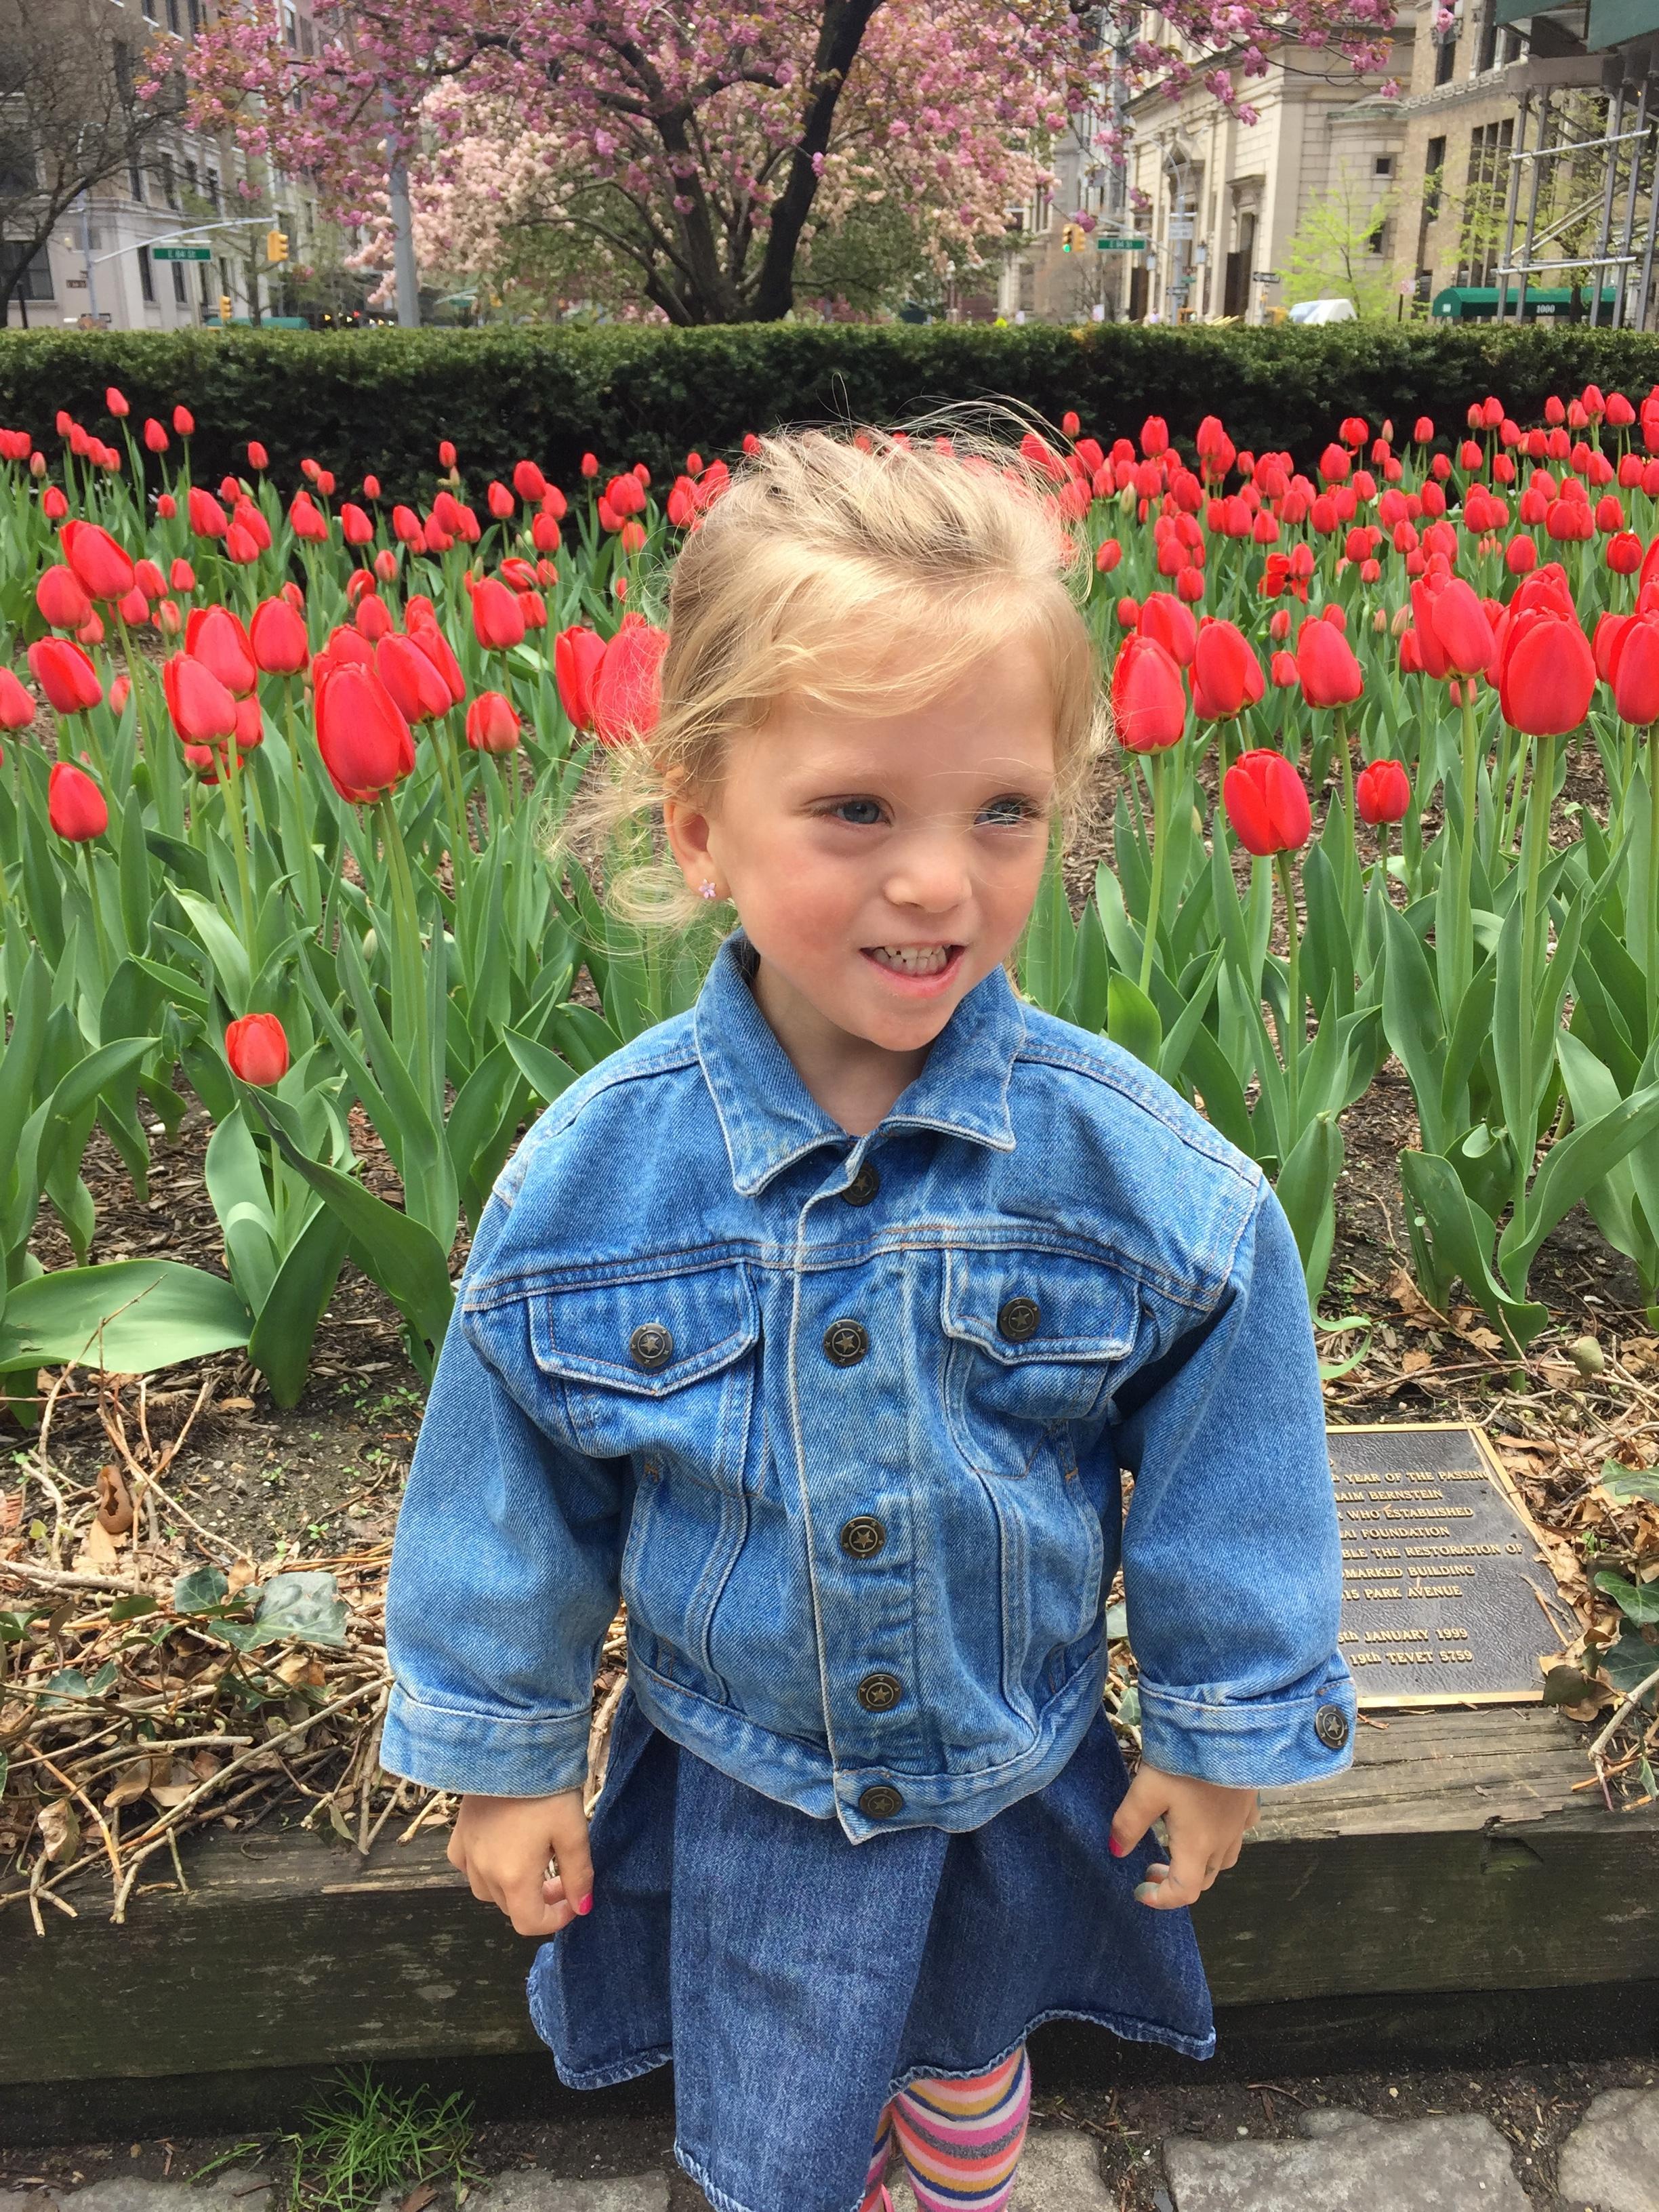 Tulips as tall as my girl